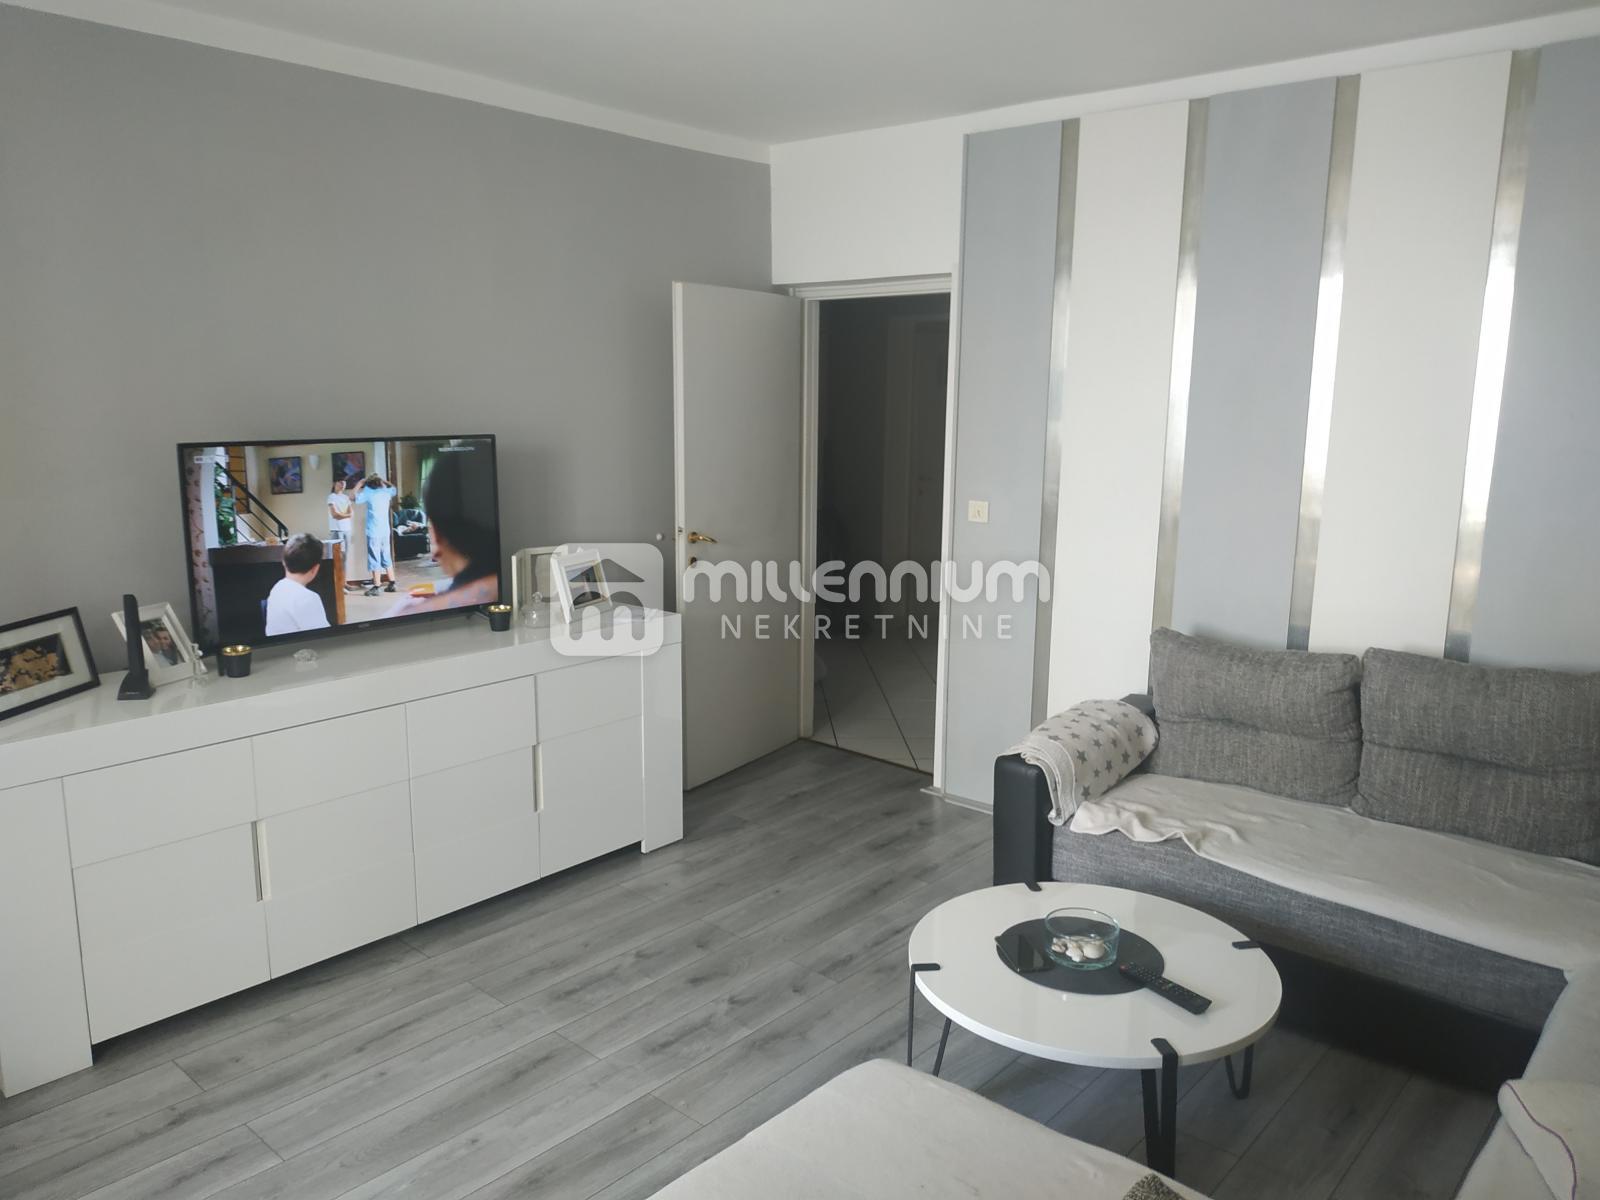 Rijeka, Kantrida, 3-sobni stan s db, lođa, pogled